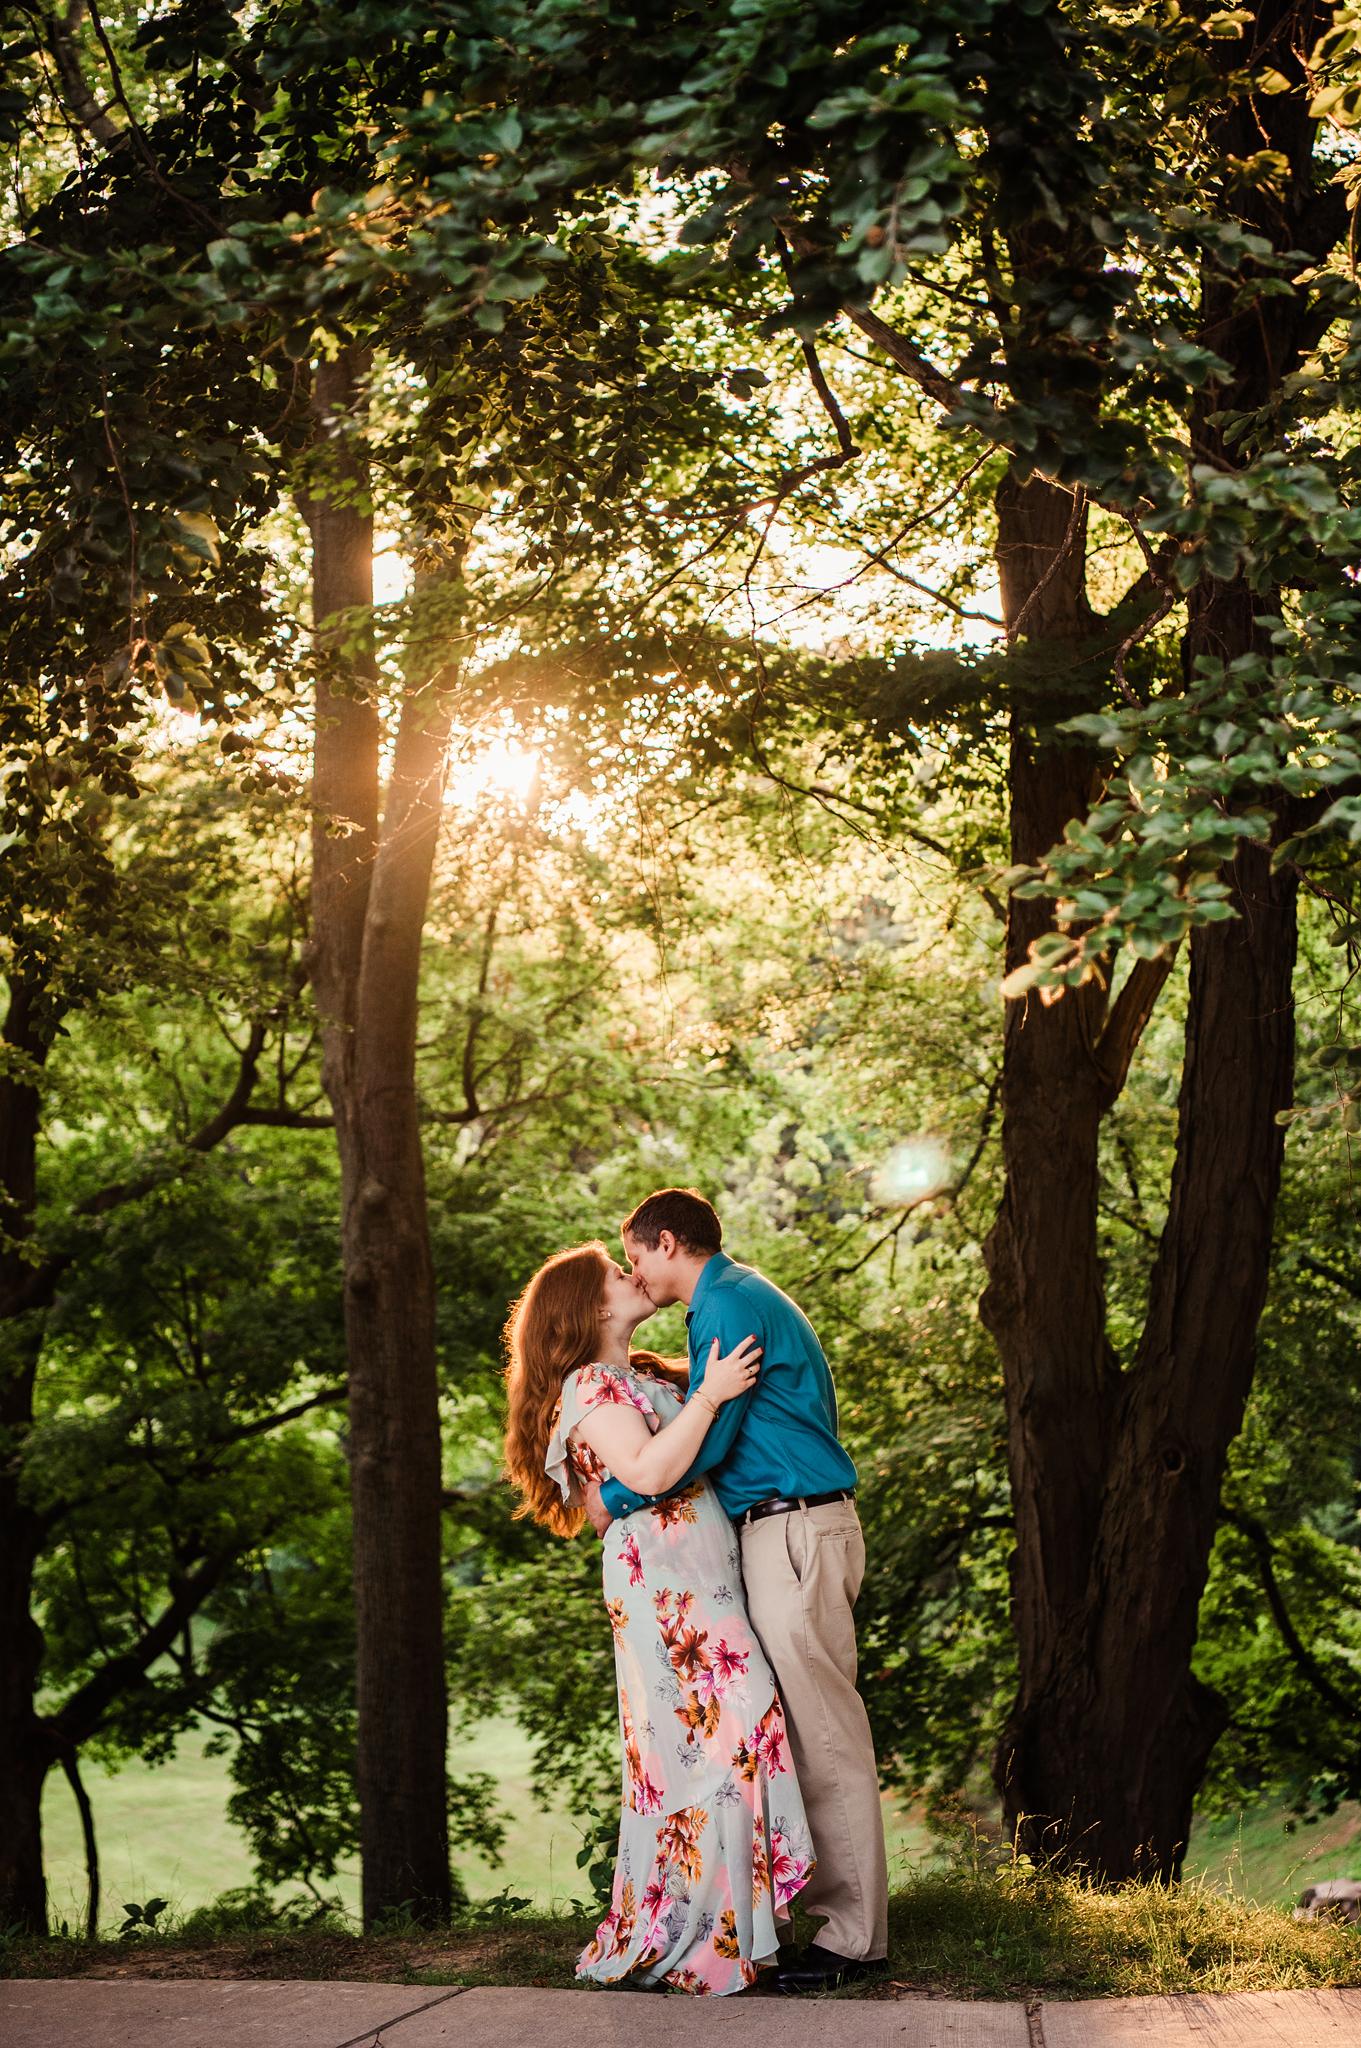 Highland_Park_Cobbs_Hill_Rochester_Engagement_Session_JILL_STUDIO_Rochester_NY_Photographer_DSC_2679.jpg